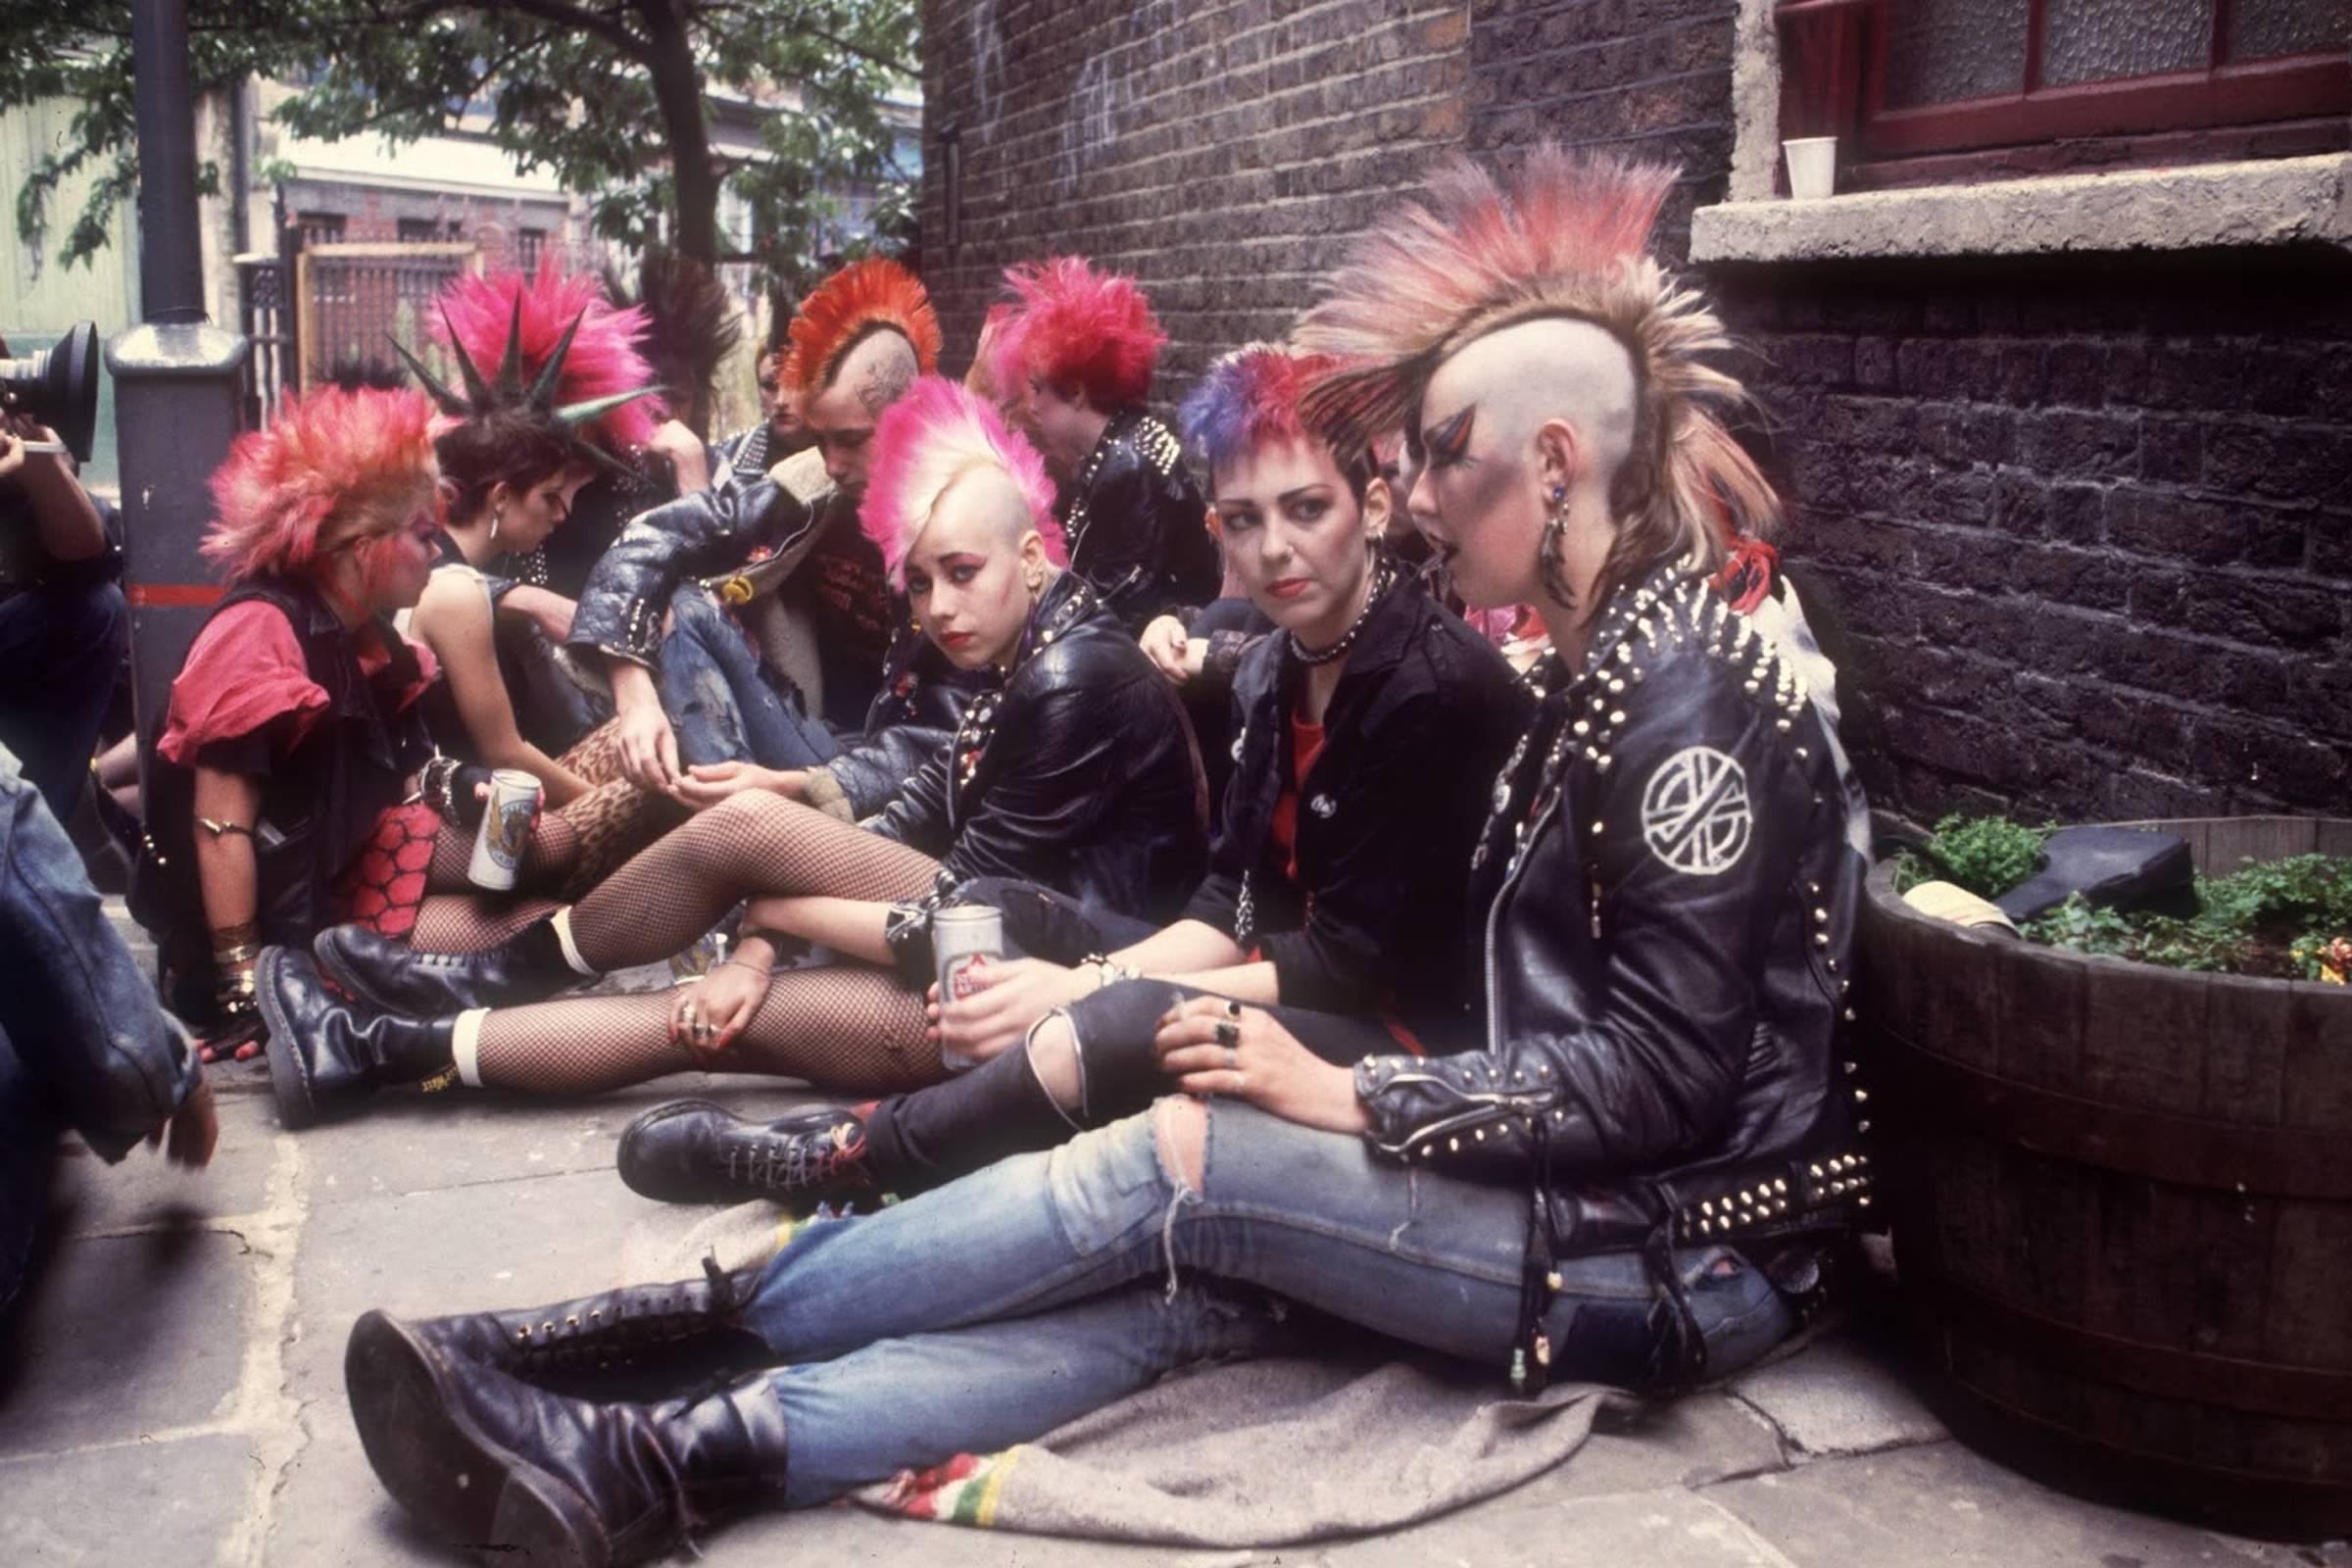 Punks wearing Dr. Martens in 1983